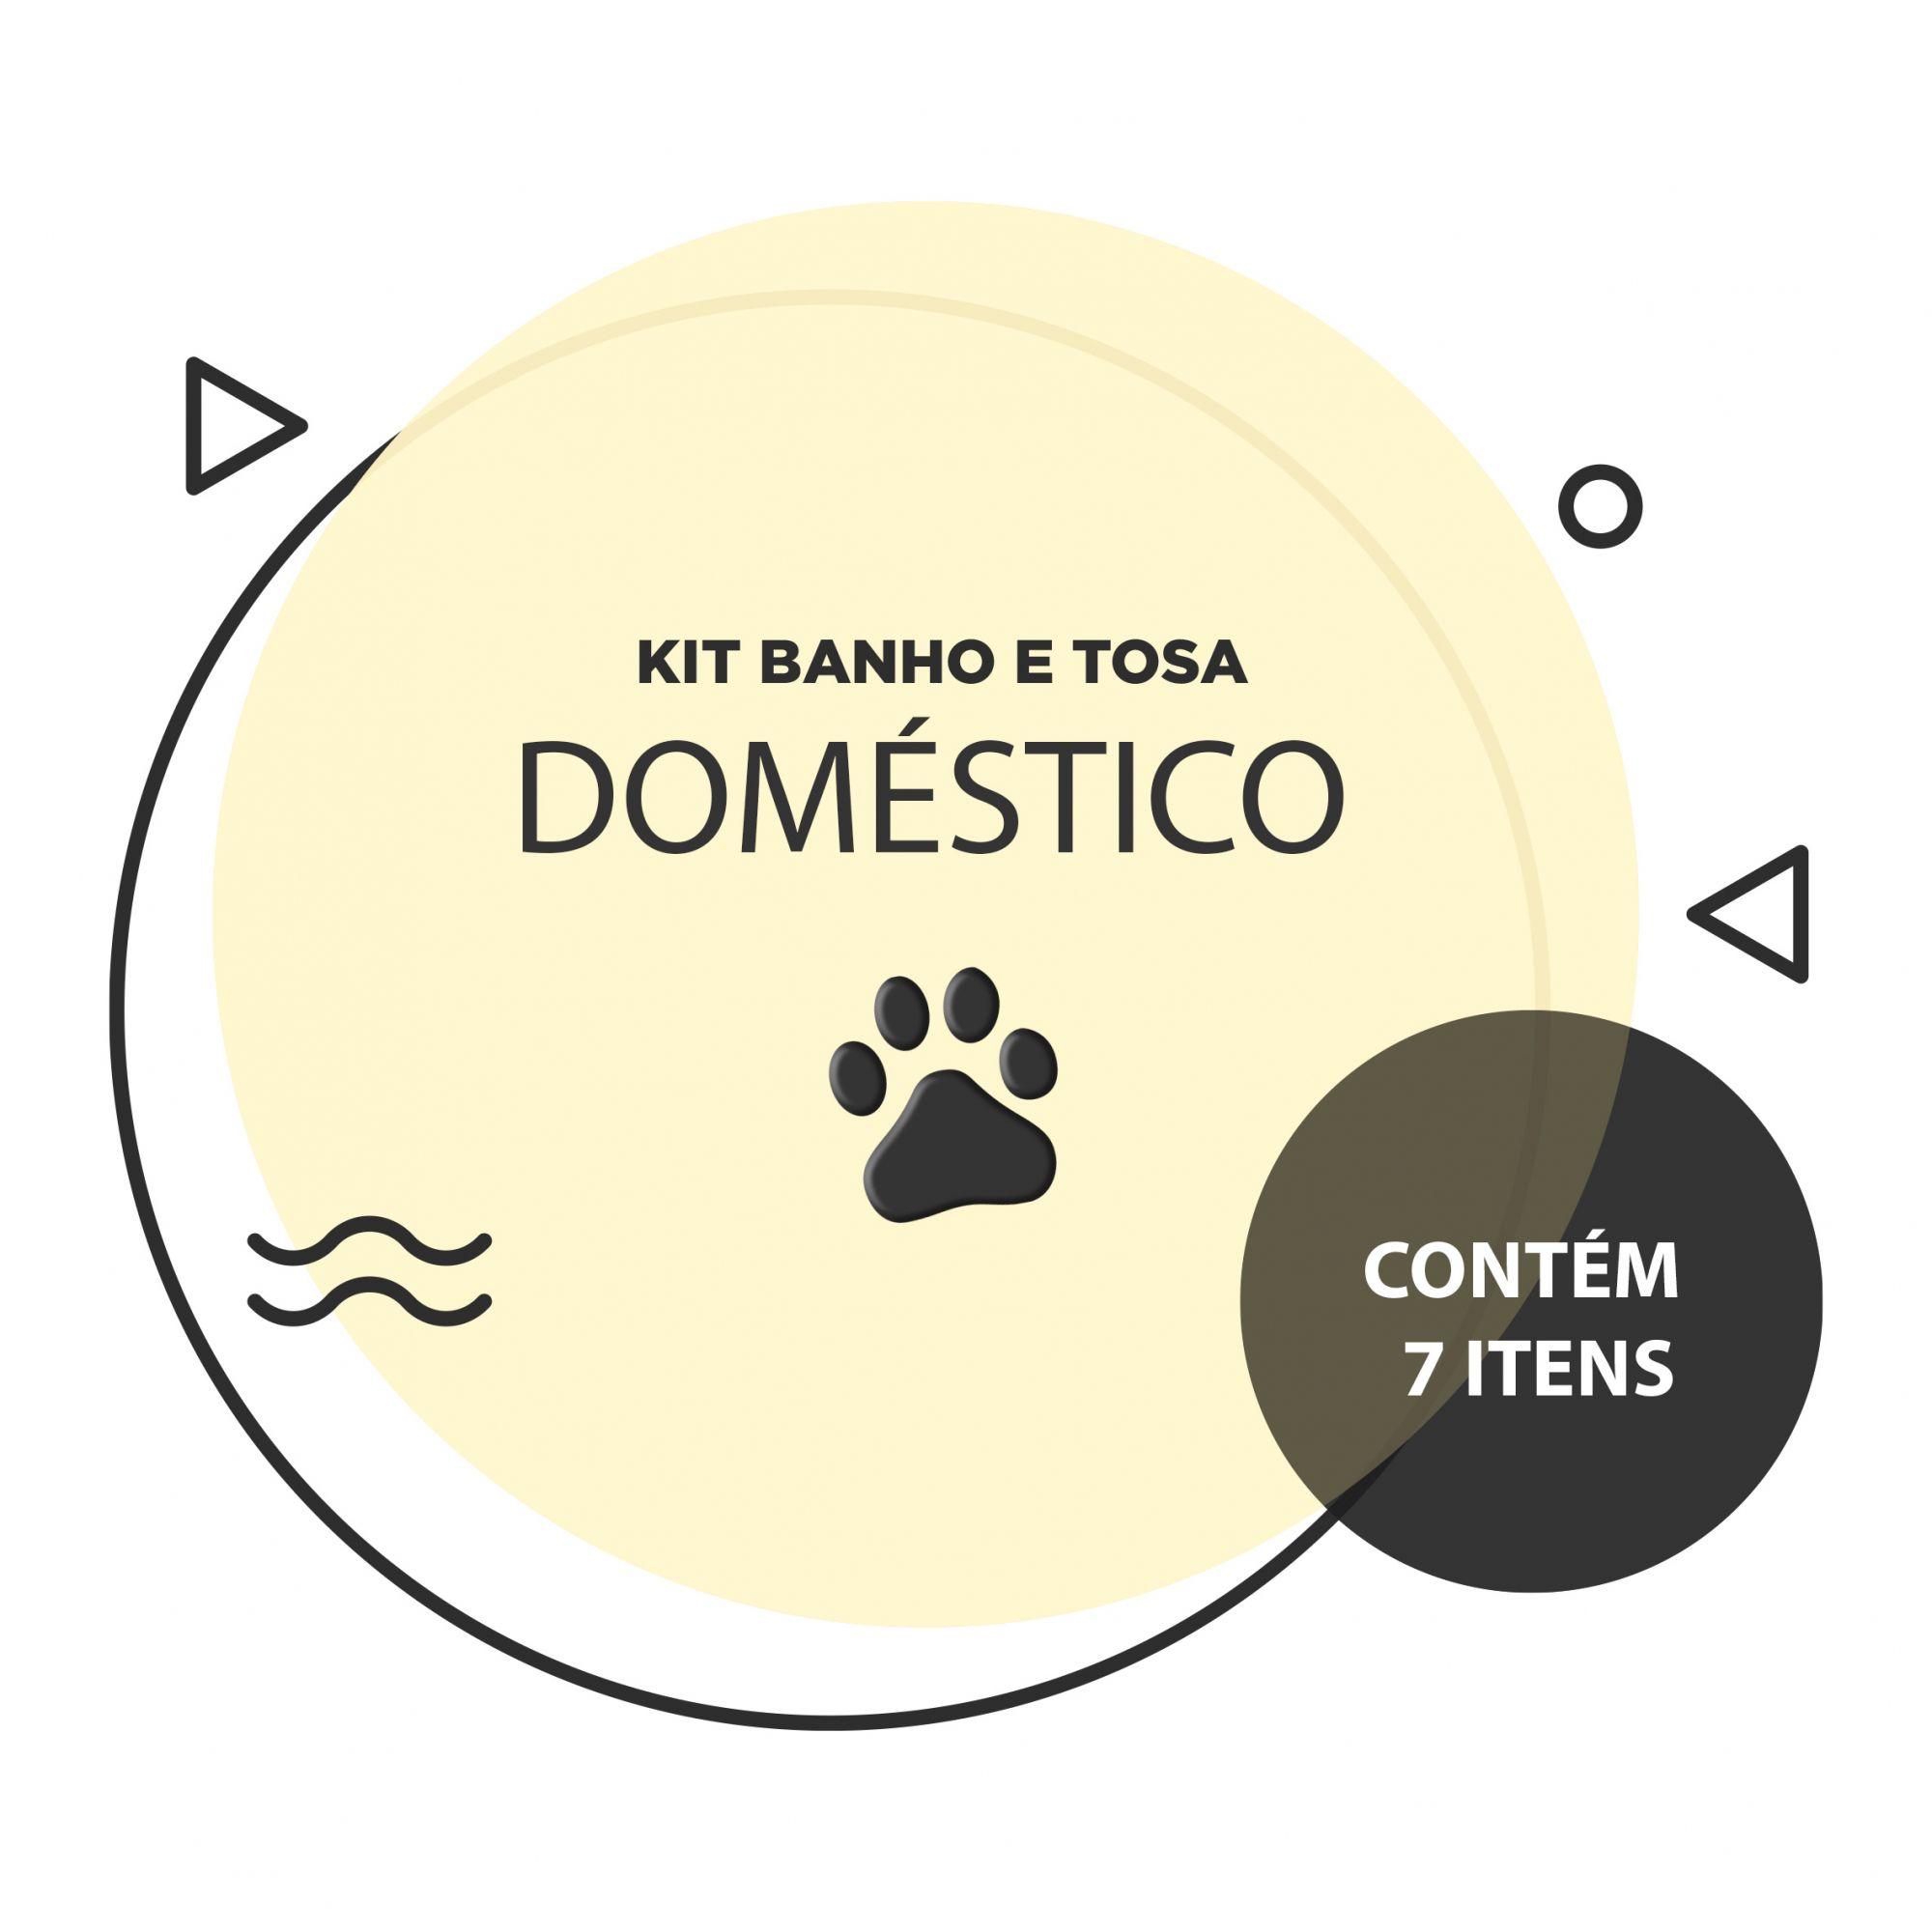 Kit Banho e Tosa - Doméstico